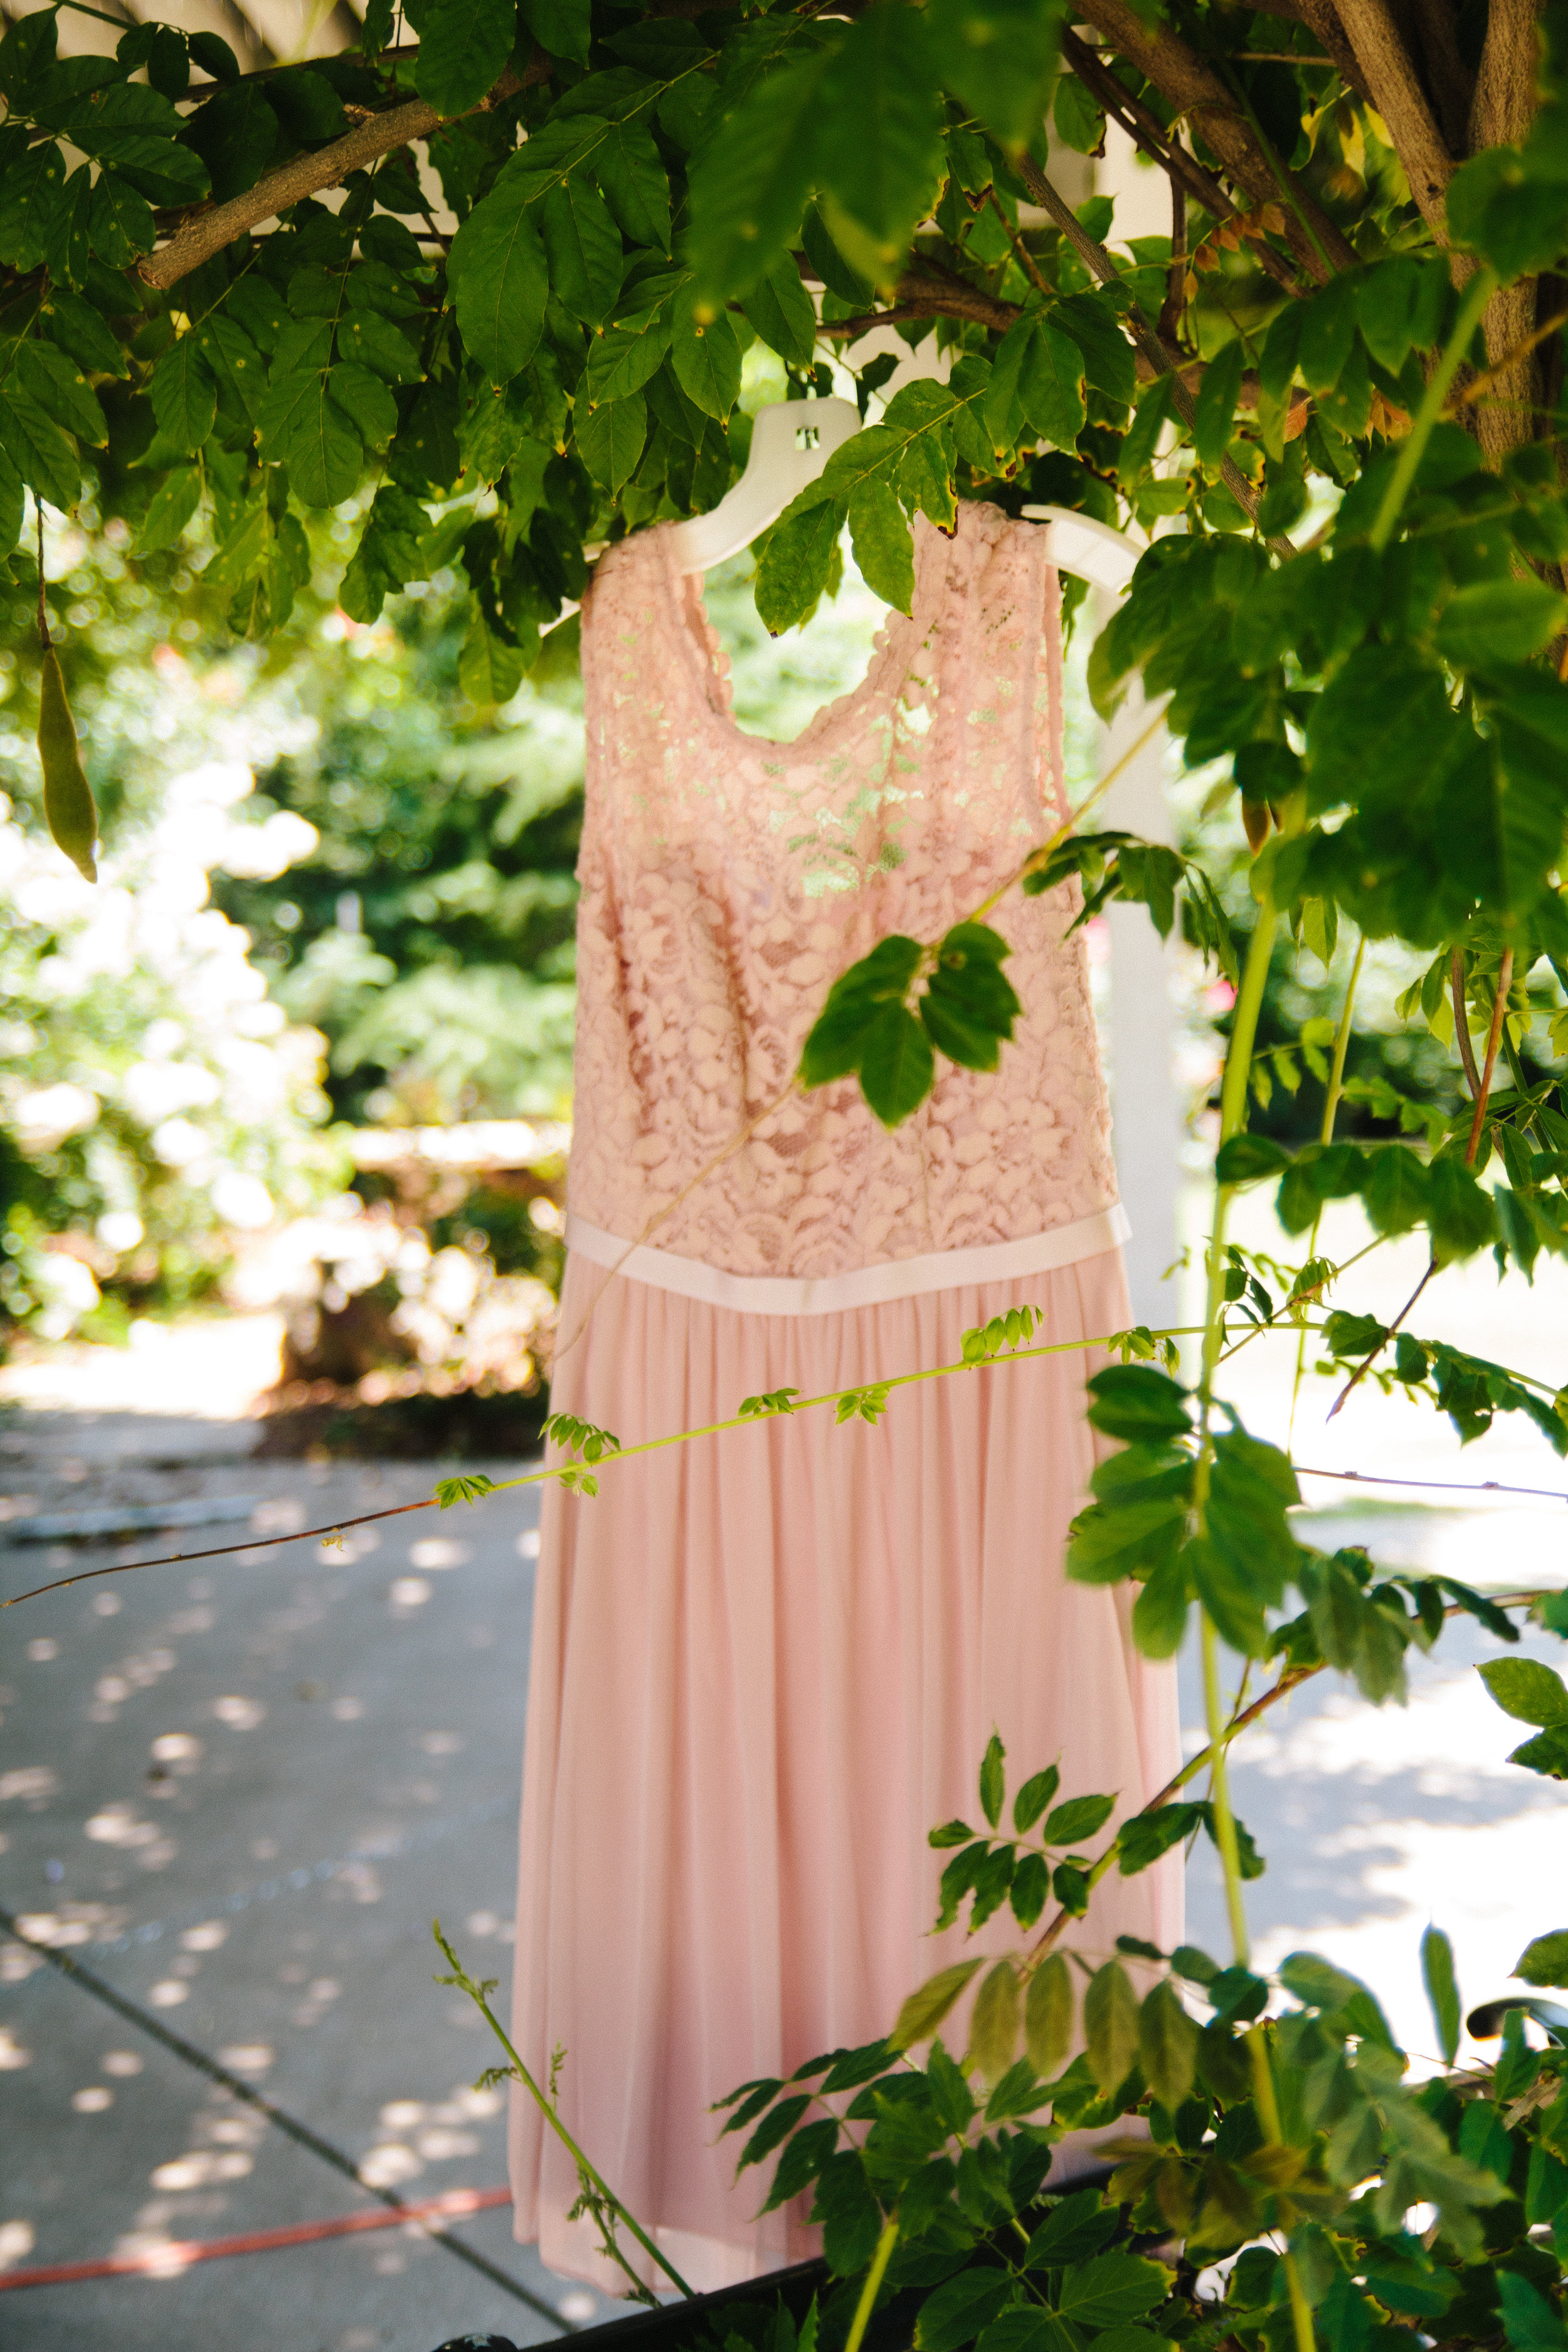 Blush Bridesmaid Dress - A Champagne + Blush Oklahoma Wedding - Meditations Event Center - From Britt's Eye View Photography